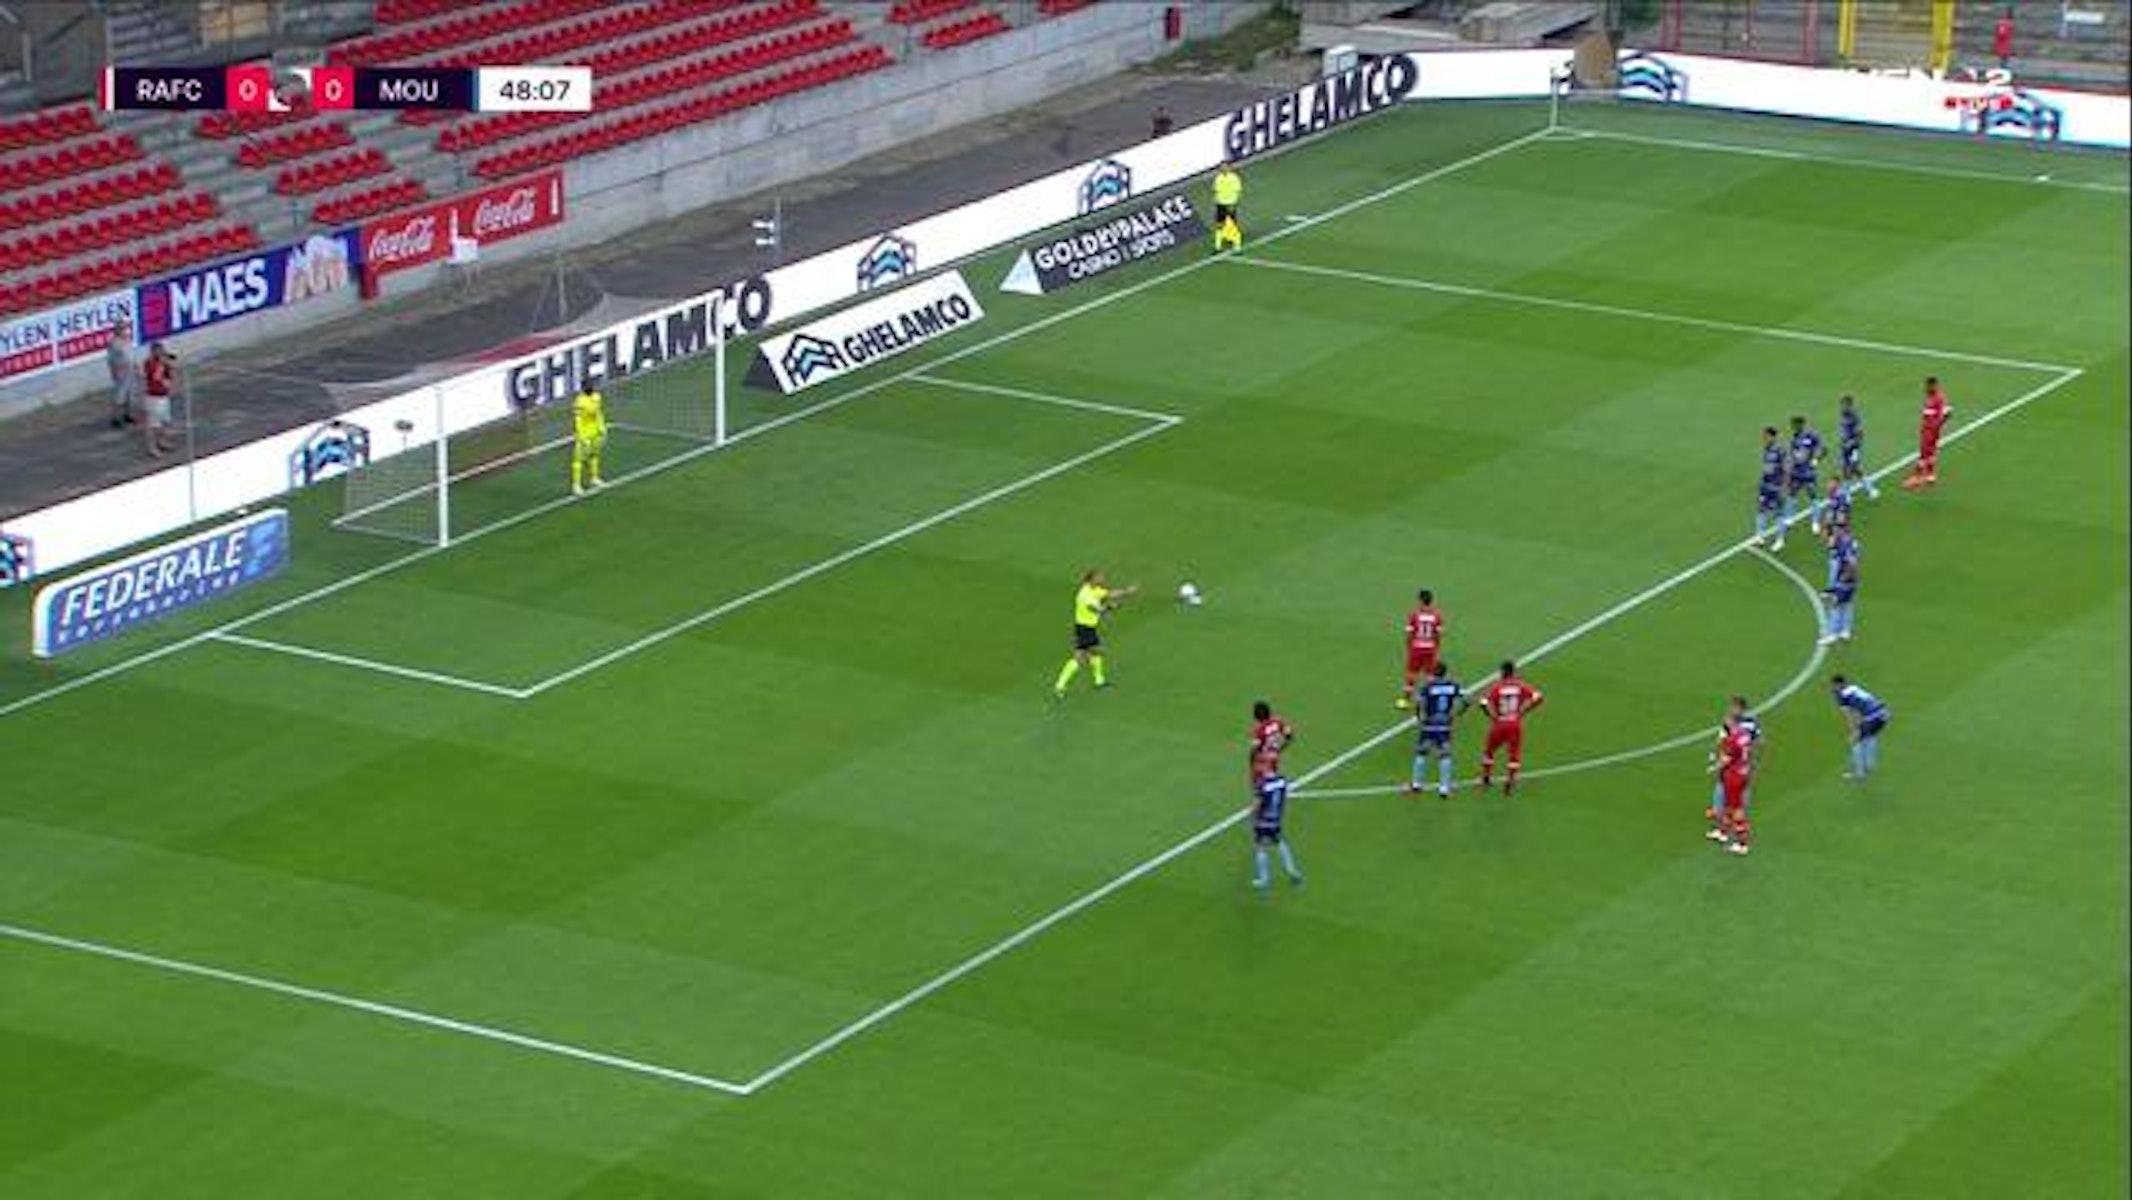 Doelpunt Lior Refaelov (Royal Antwerp FC vs. Royal Excel Mouscron)